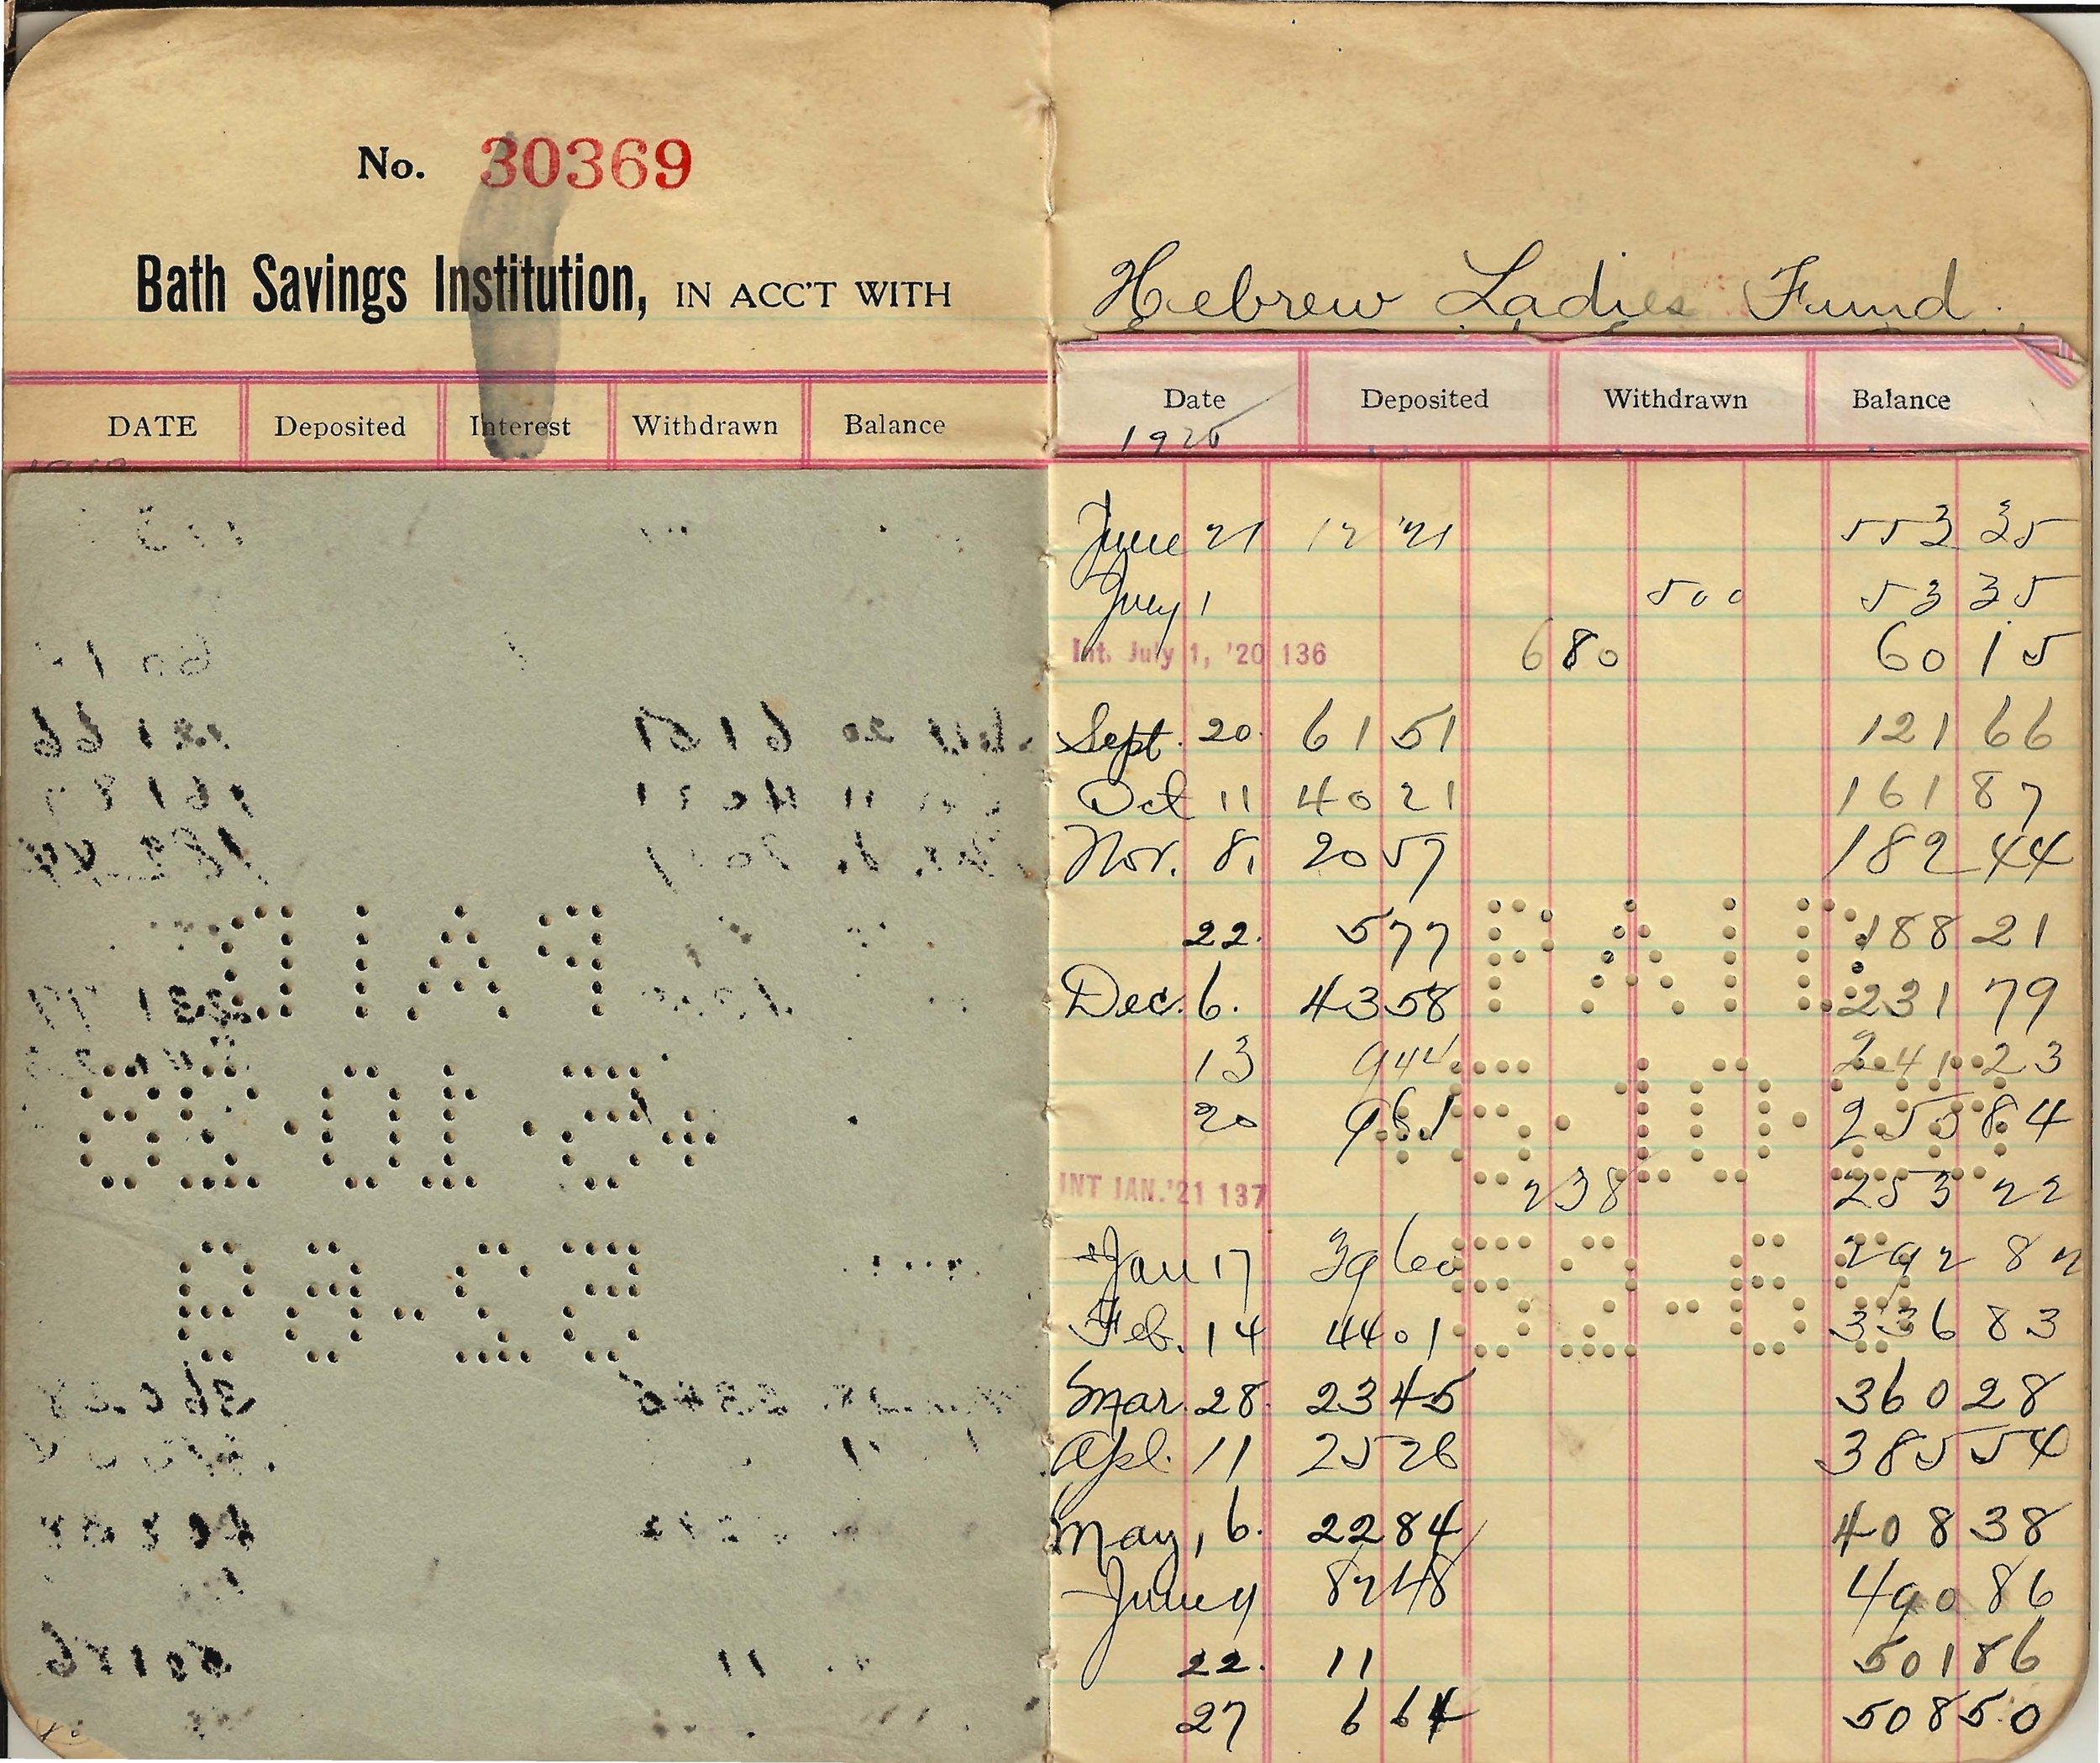 Bath Savings Institution (1919-27)_Page_05.jpg